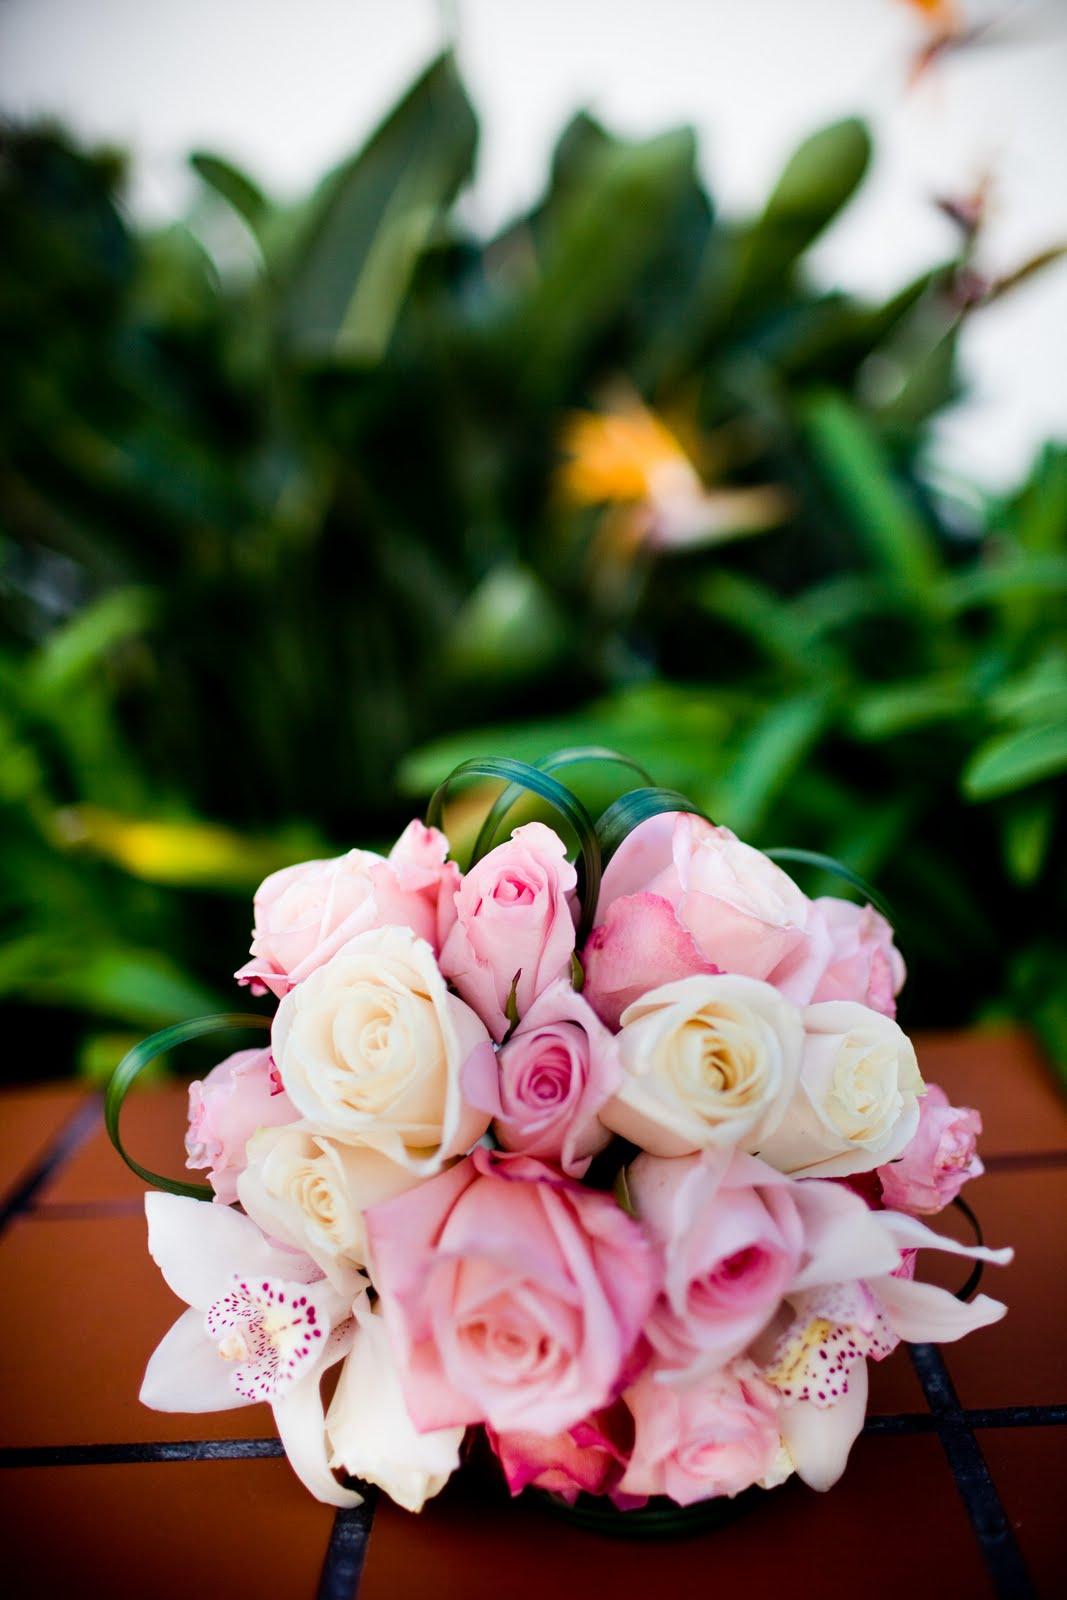 wedding flowers wedding design floral design san diego county ca la jolla san diego. Black Bedroom Furniture Sets. Home Design Ideas